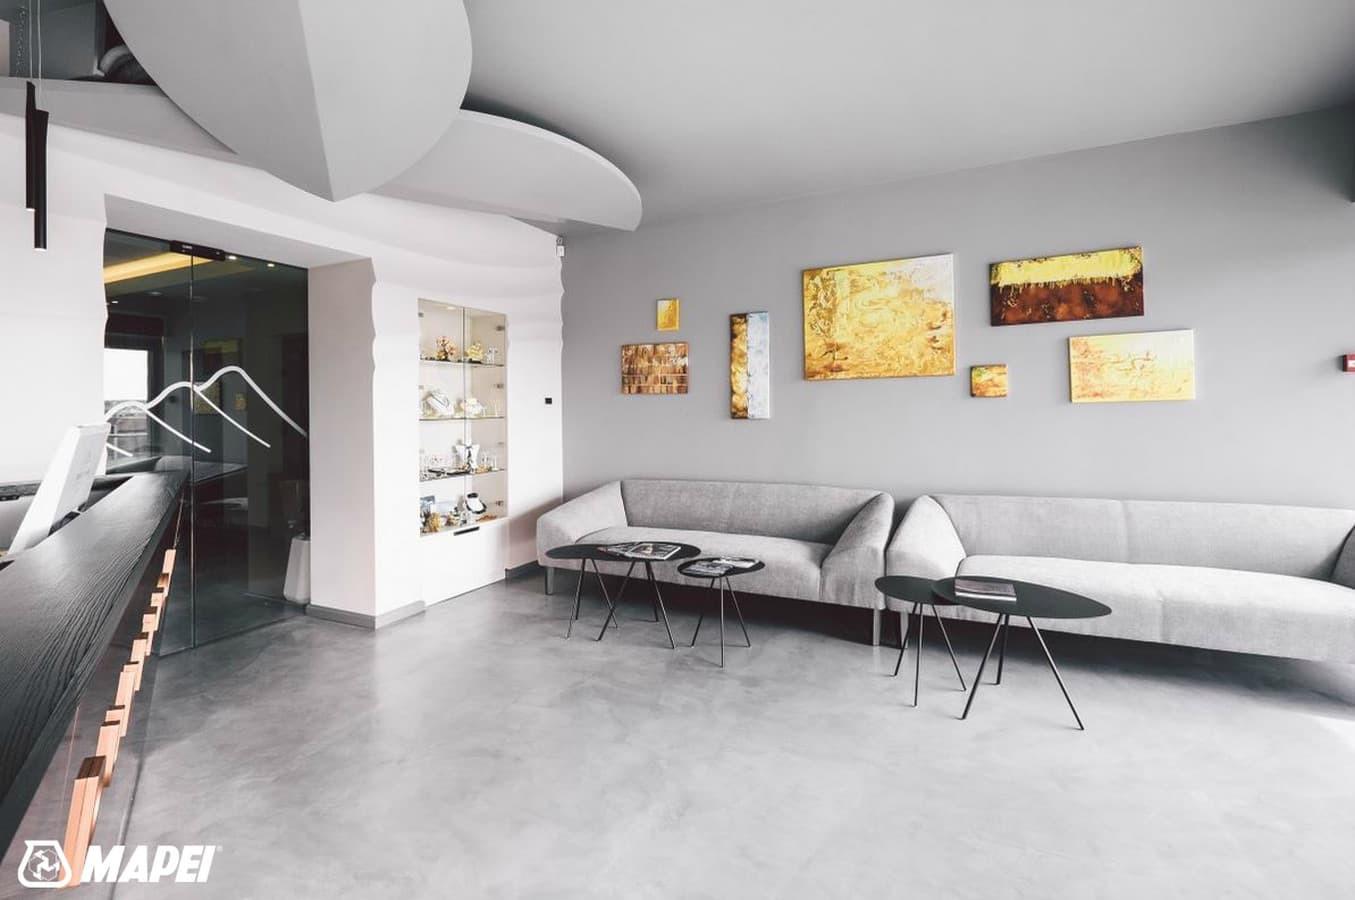 ULTRATOP LOFT cementinė dekoratyvinė grindų danga įrengta viešbutyje Klaipėdoje. http://www.velvemst.lt/uploads/Brochure_Ultratop_Loft_LT_web.pdf